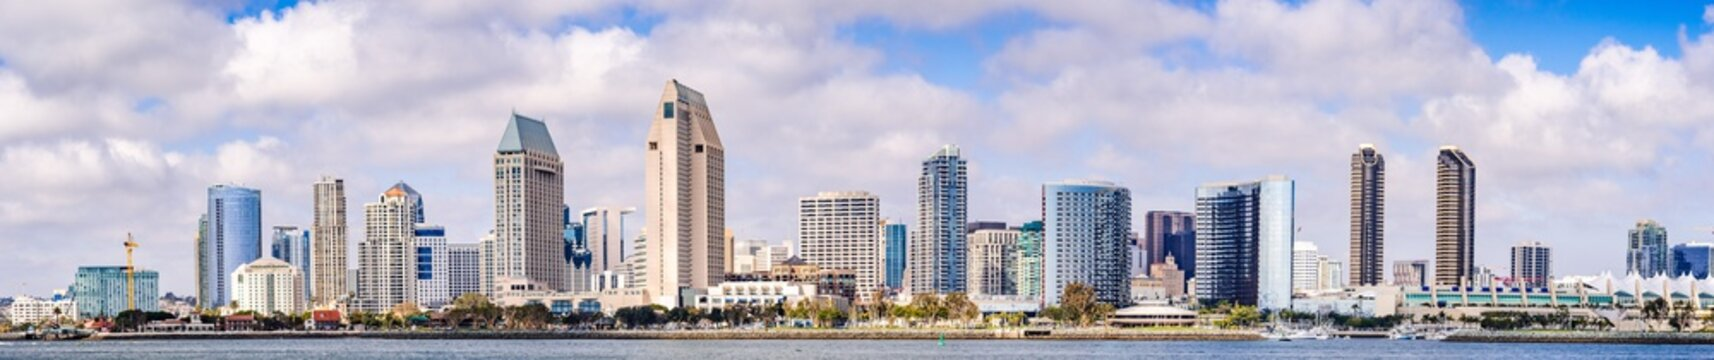 Panoramic view of the downtown San Diego skyline, California